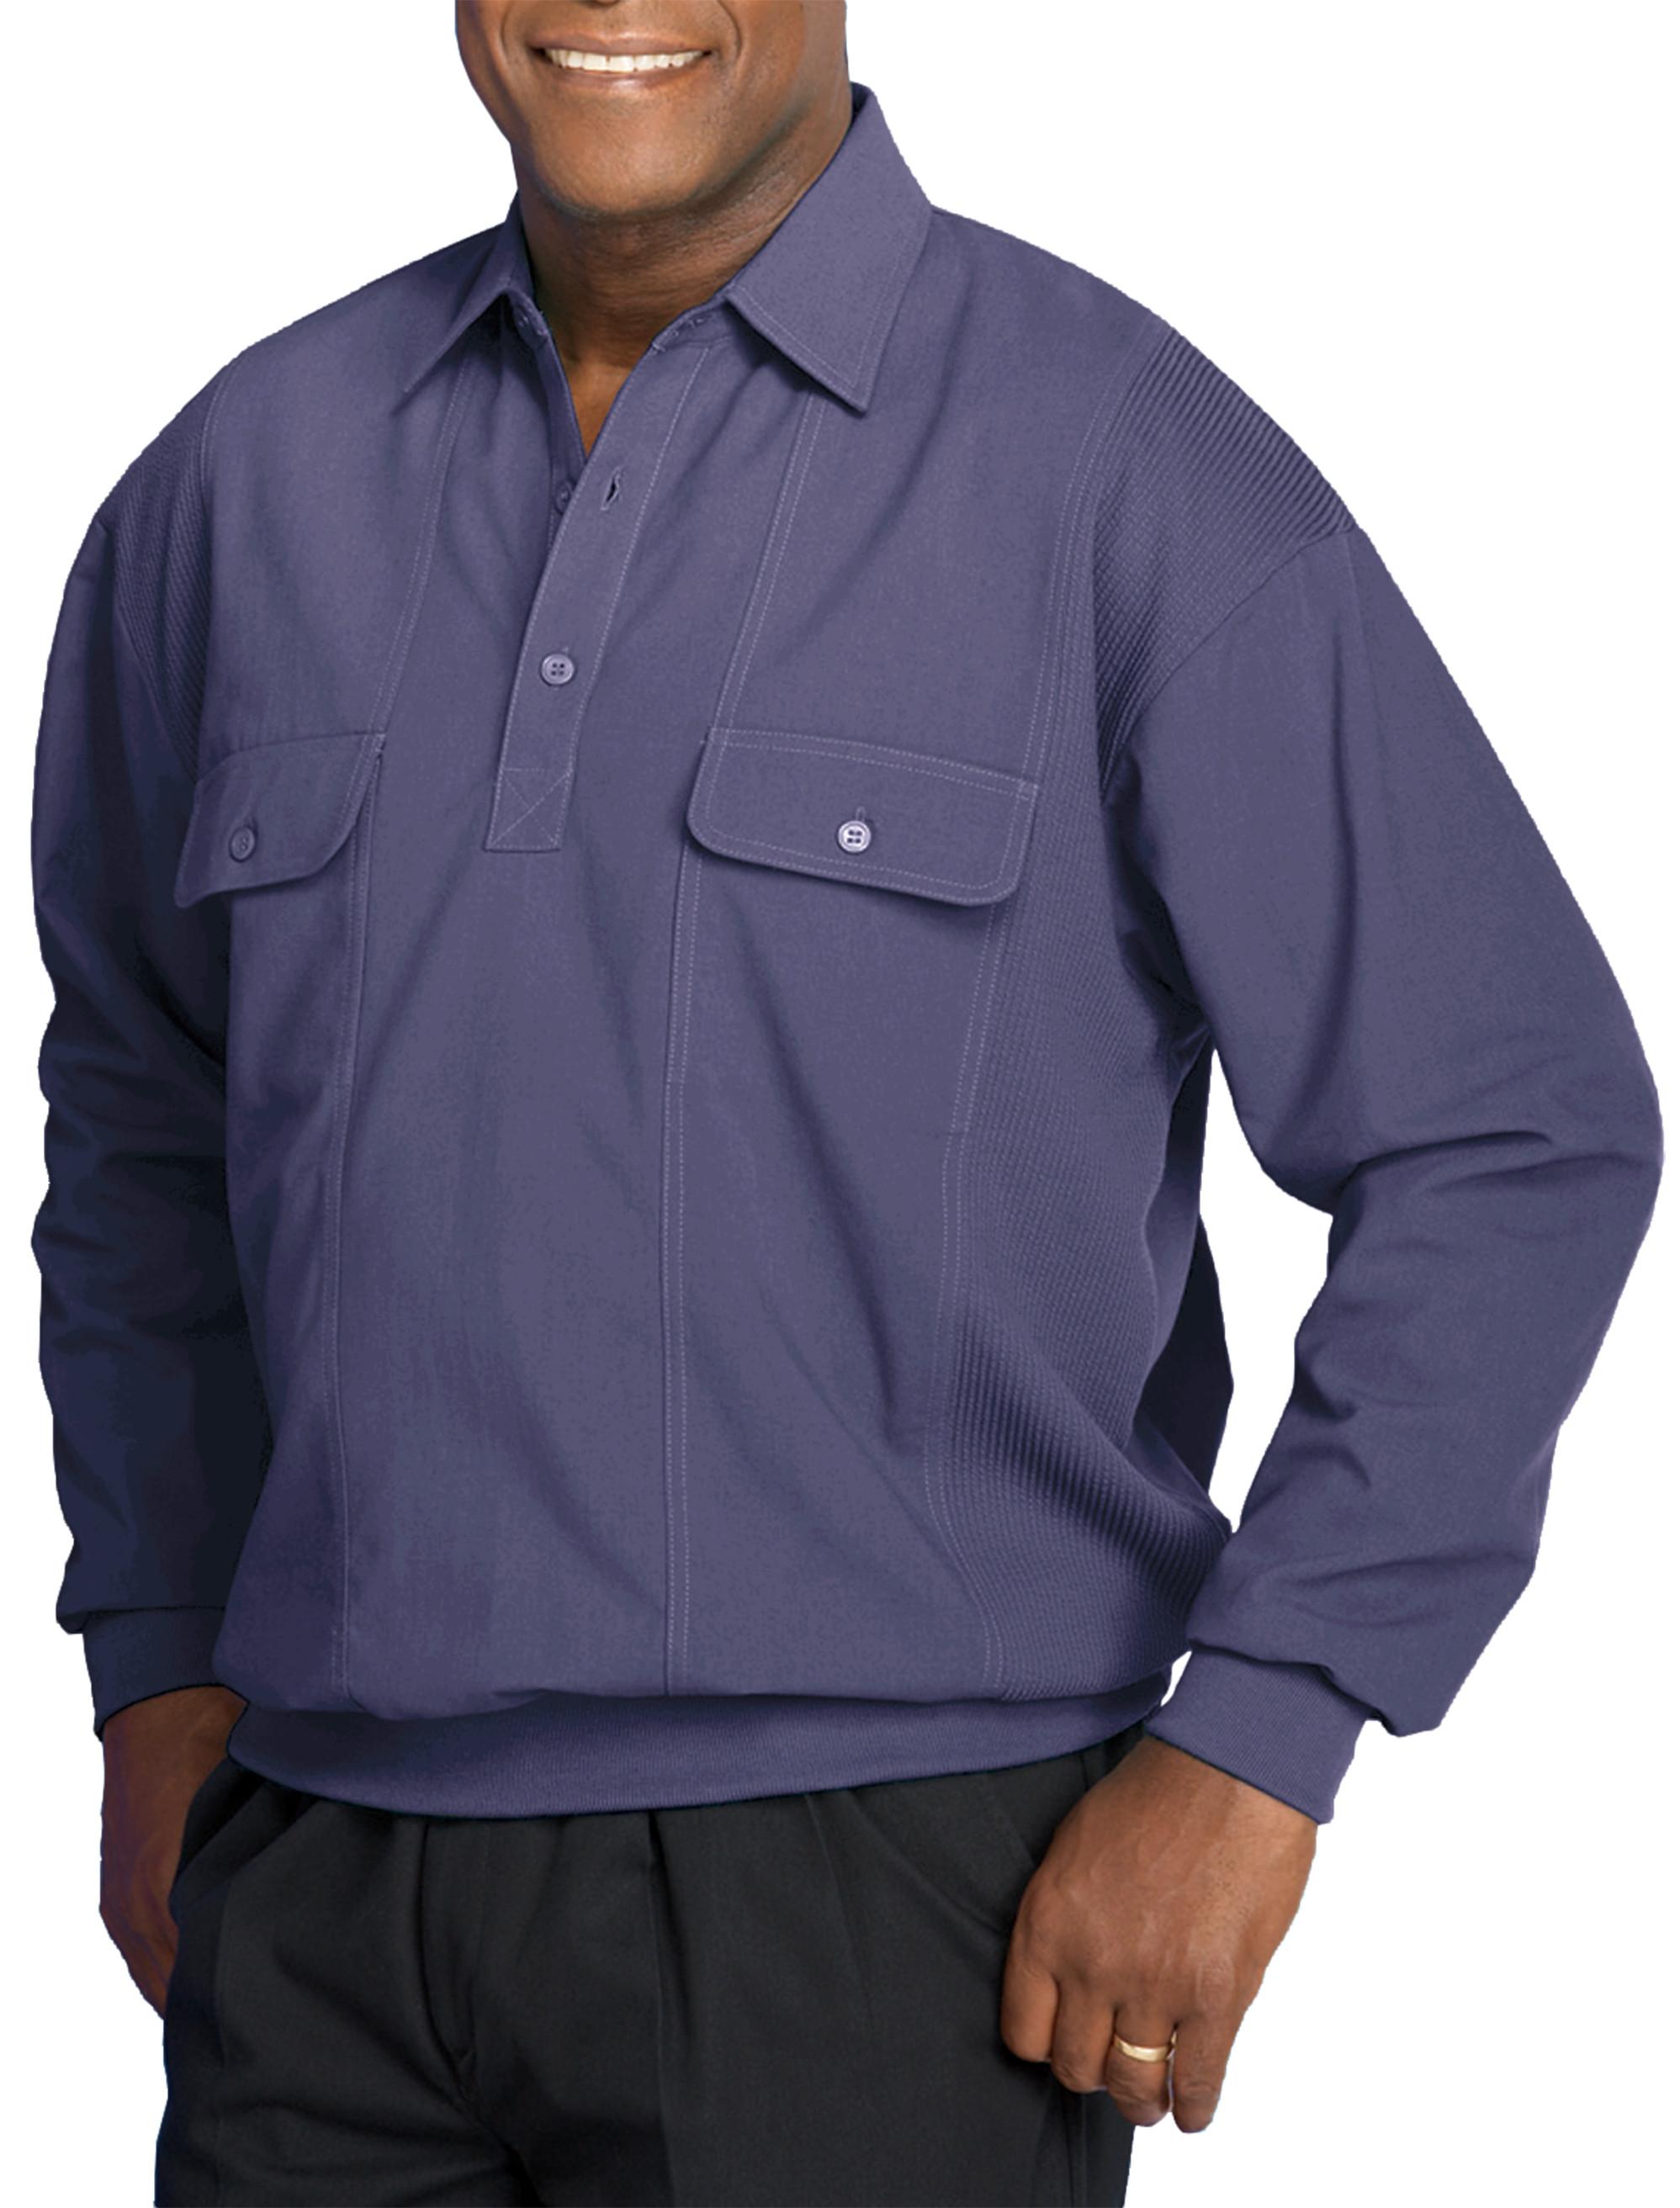 Harbor Bay Long Sleeve Mesh Panel Banded Bottom Shirt